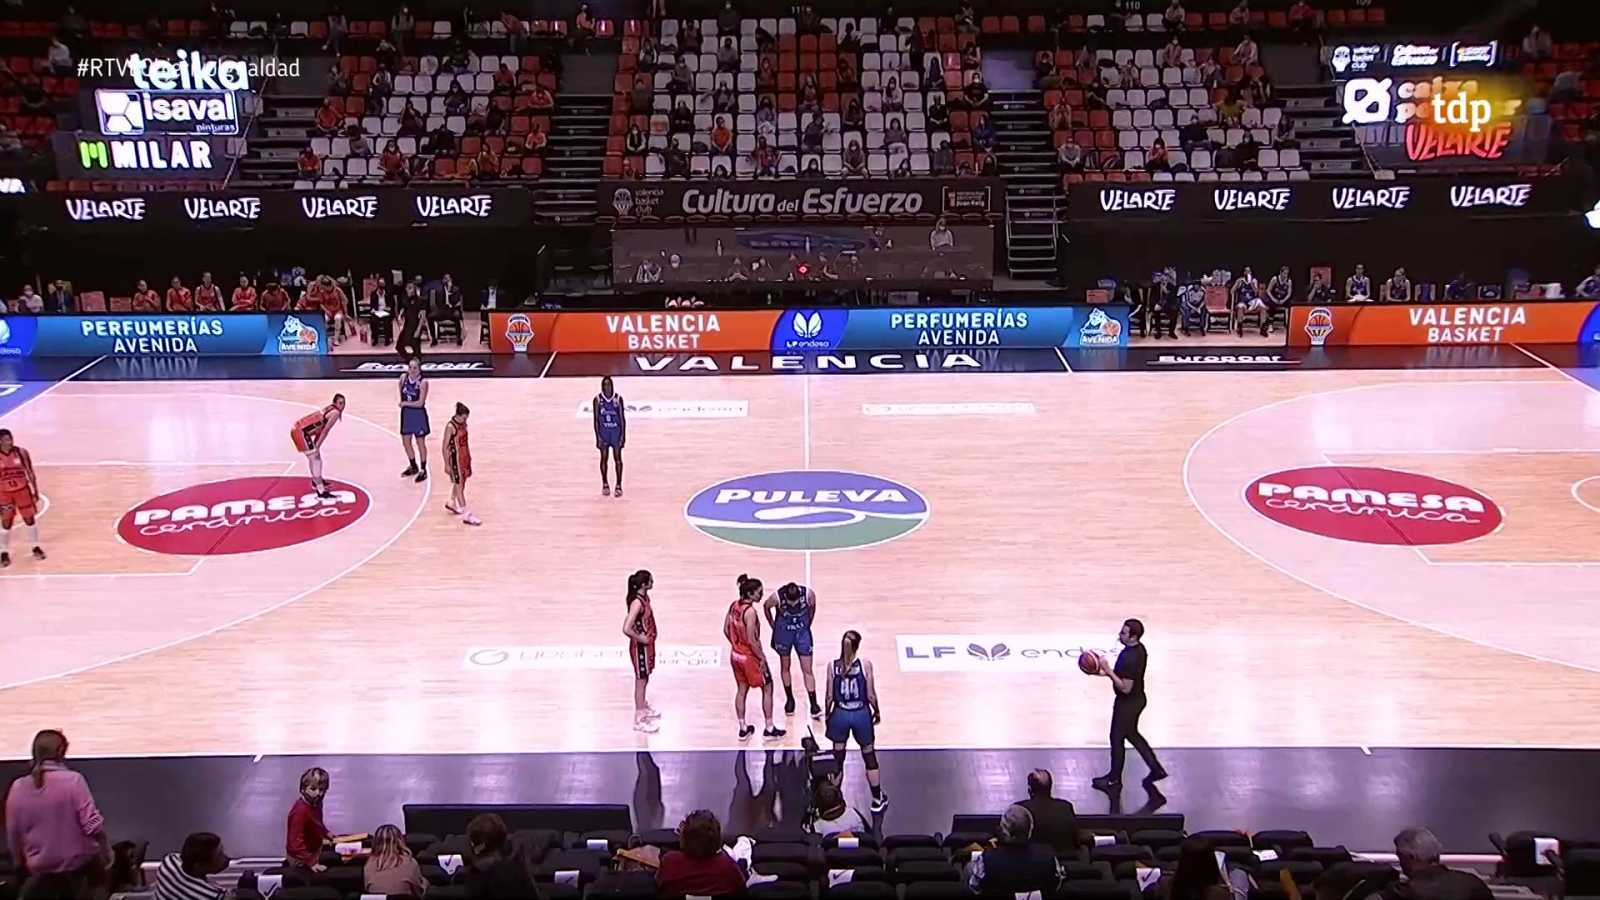 Baloncesto - Liga femenina Endesa. 28ª jornada: Valencia Basket - Perfumerías Avenida - ver ahora